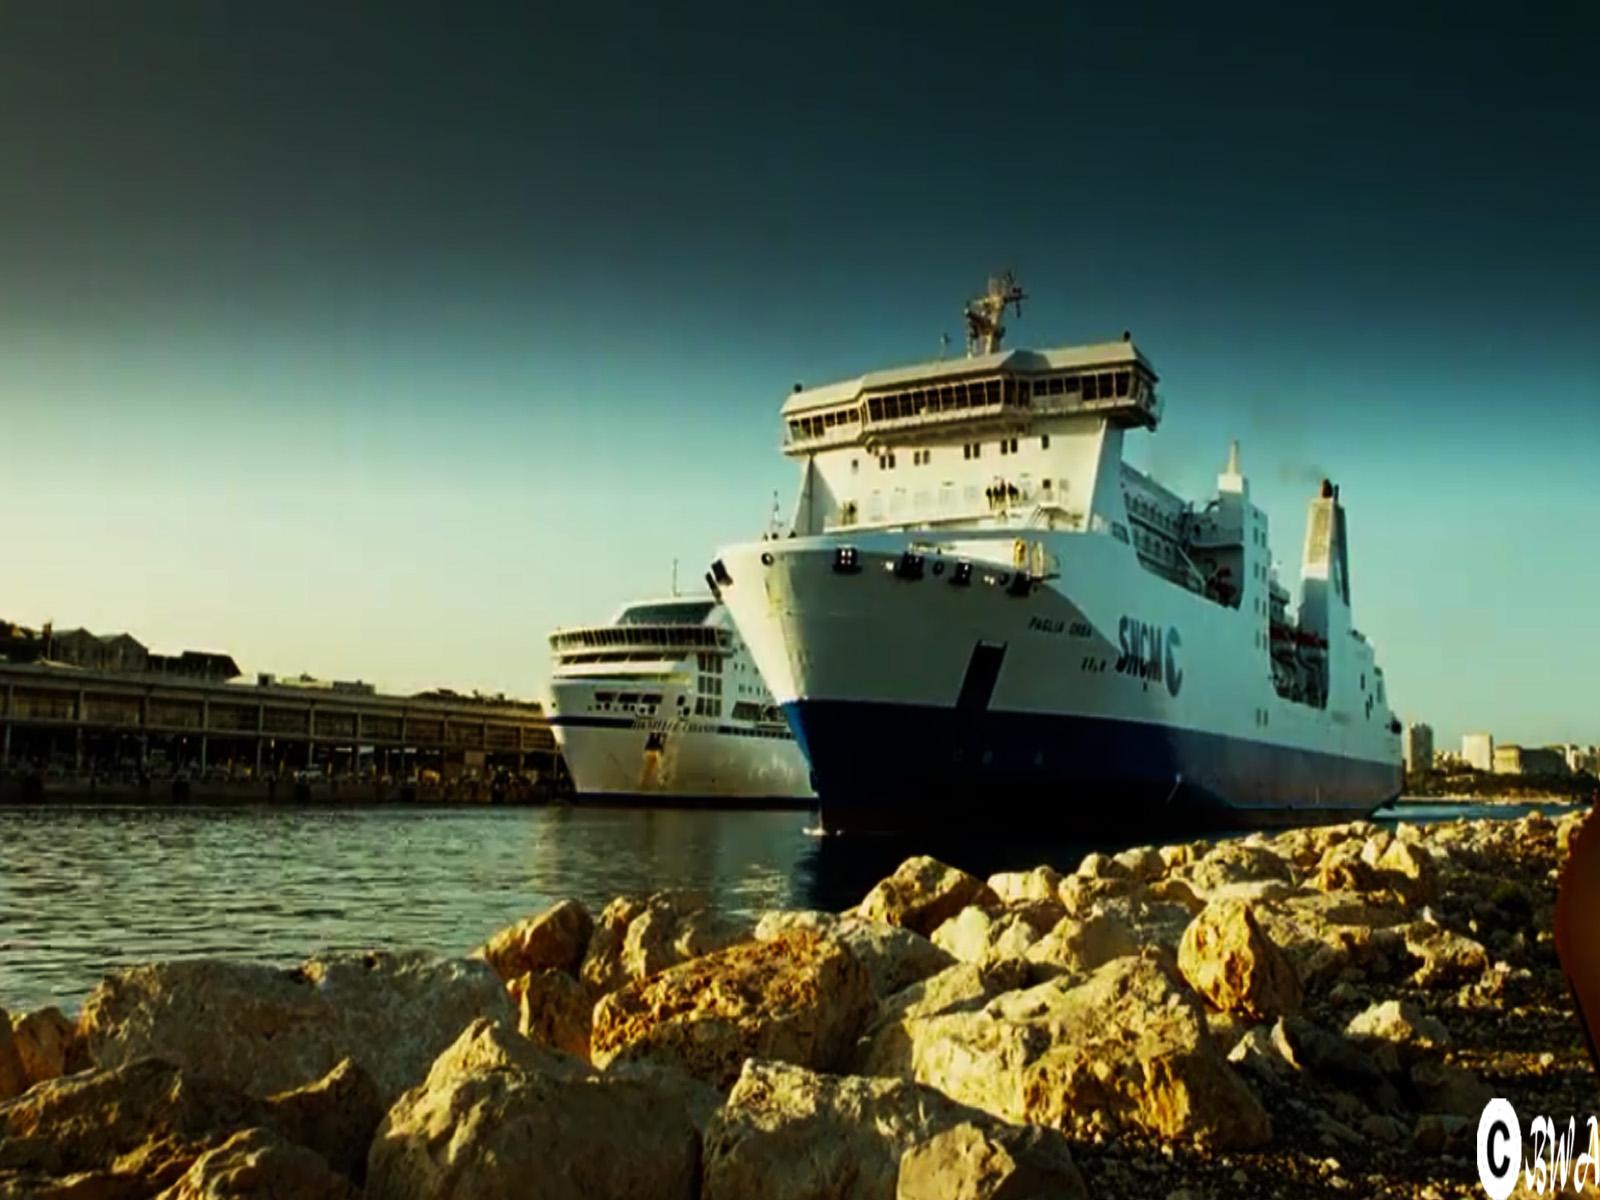 http://2.bp.blogspot.com/-5ieB9_GcIEQ/TtXELTbZgCI/AAAAAAAAA6E/eV2CwqXKX5U/s1600/harbour_Ship_at_Transporter_3-by-banditajj4-wallpaper-art.jpg